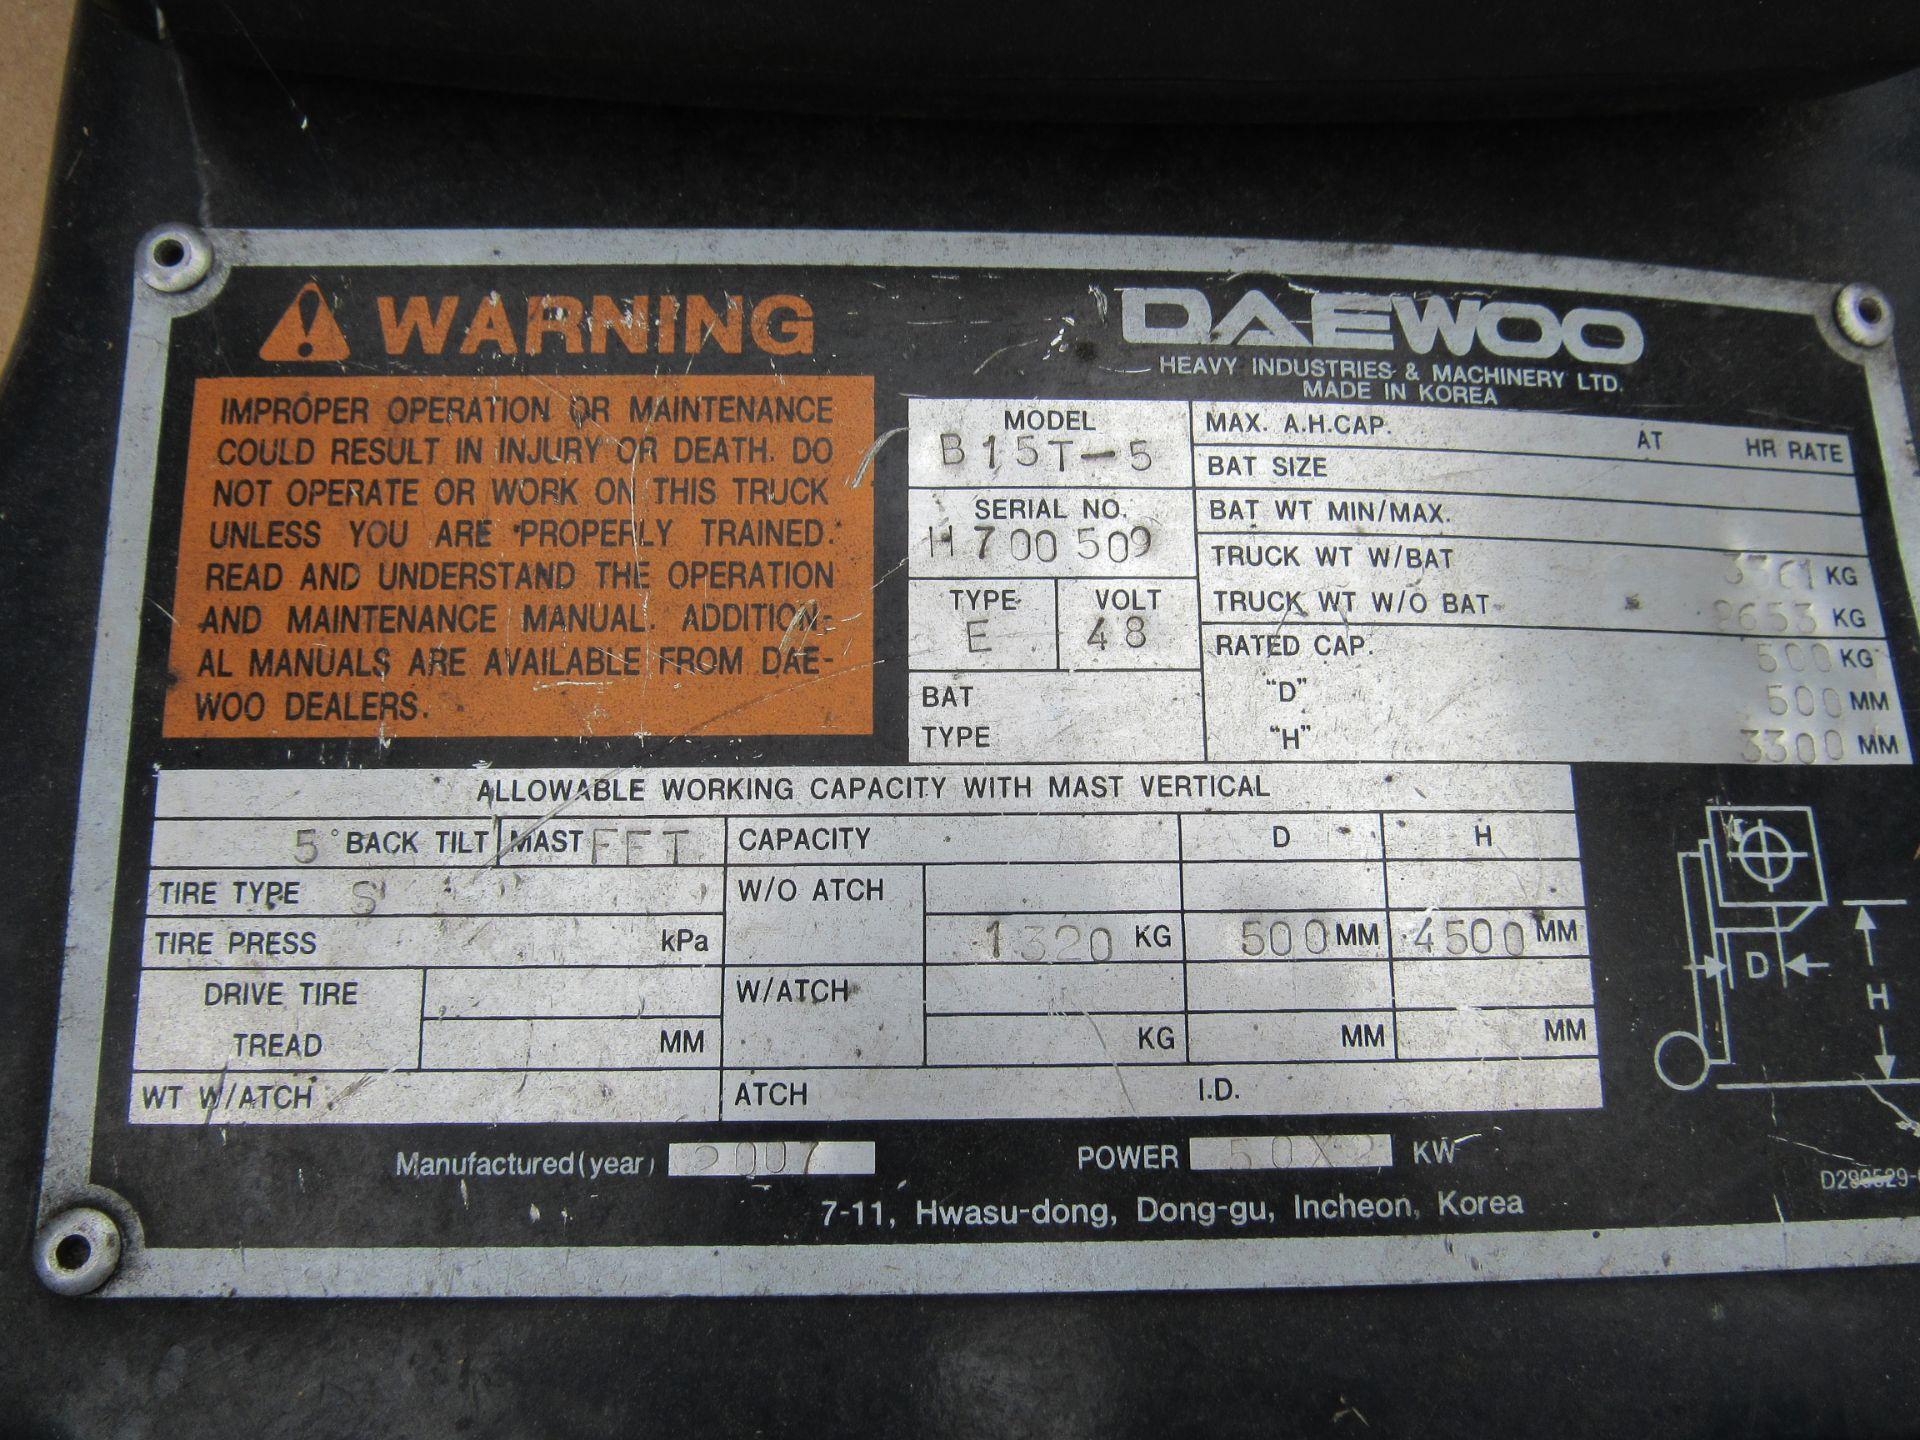 Doosan Daewoo B15T-5 Battery Forklift, 1320kg Capacity, 2278 Hours, Triple Mast, Side Shift, 2007, - Image 7 of 21